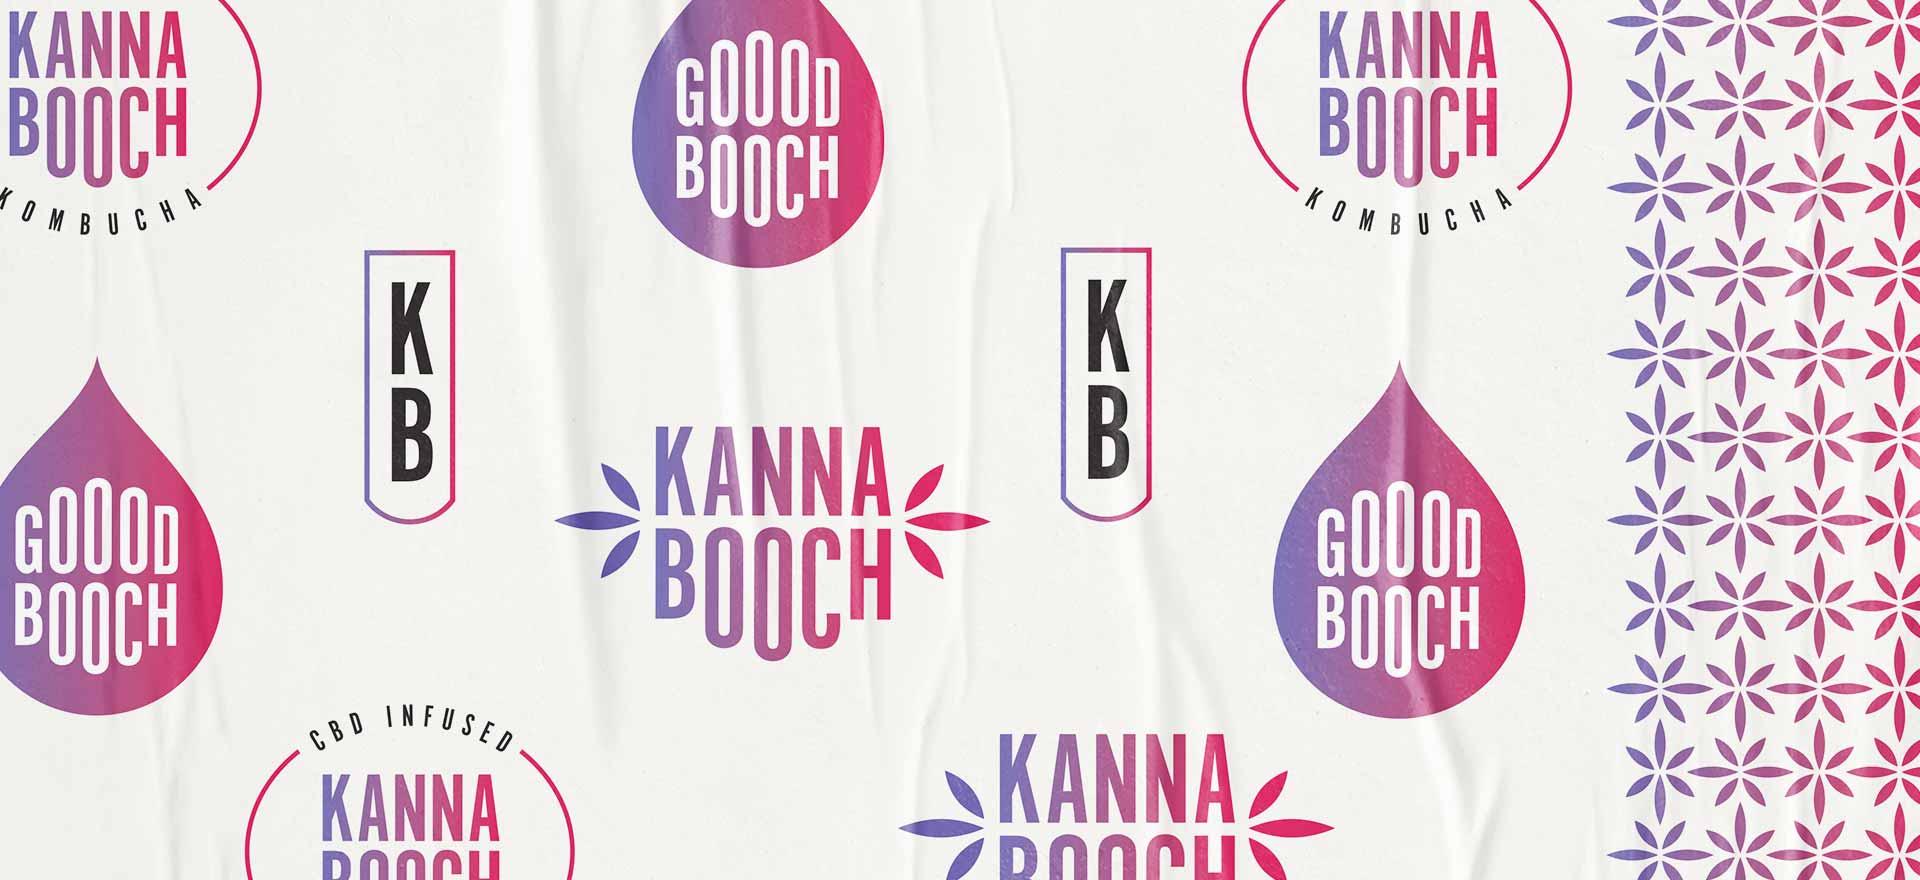 Kannabooch brand elements